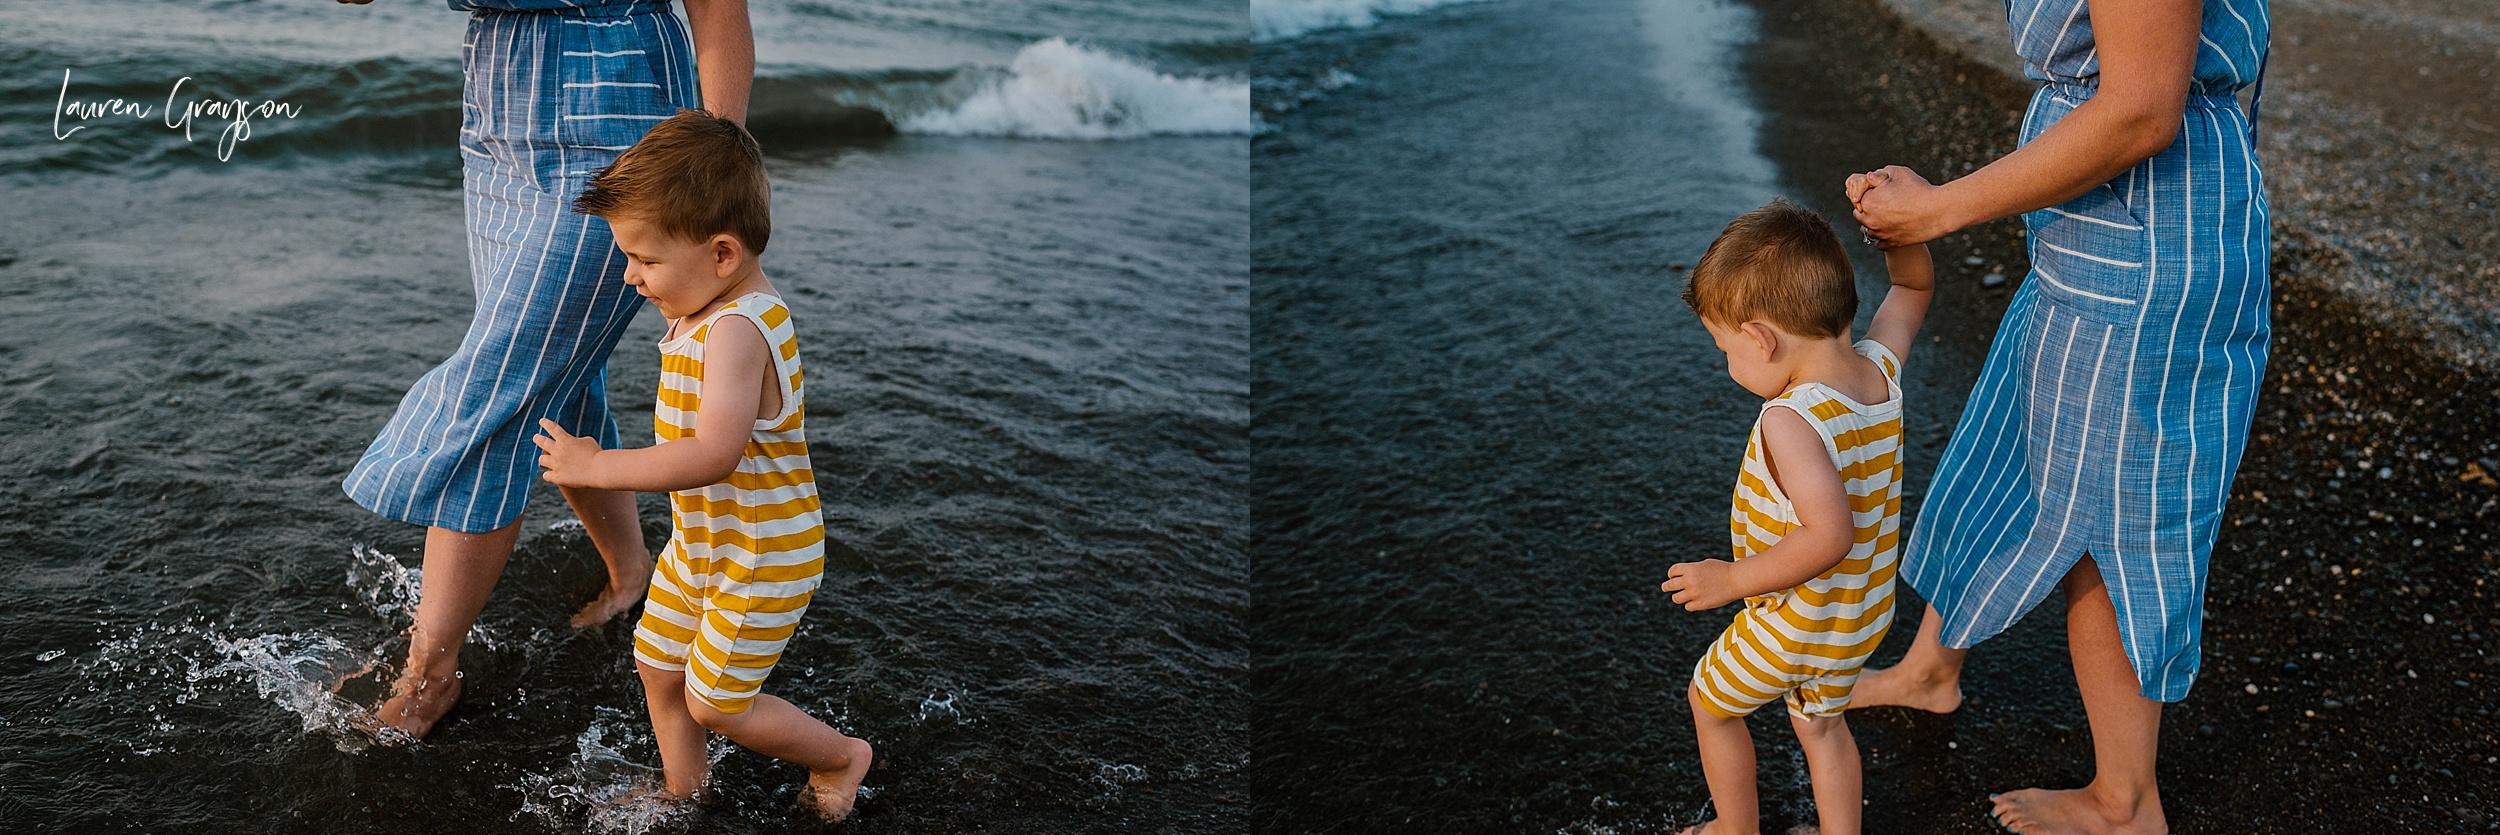 lauren-grayson-photography-cleveland-ohio-photographer-mentor-headlands-beach-maternity-session-2018_0765.jpg